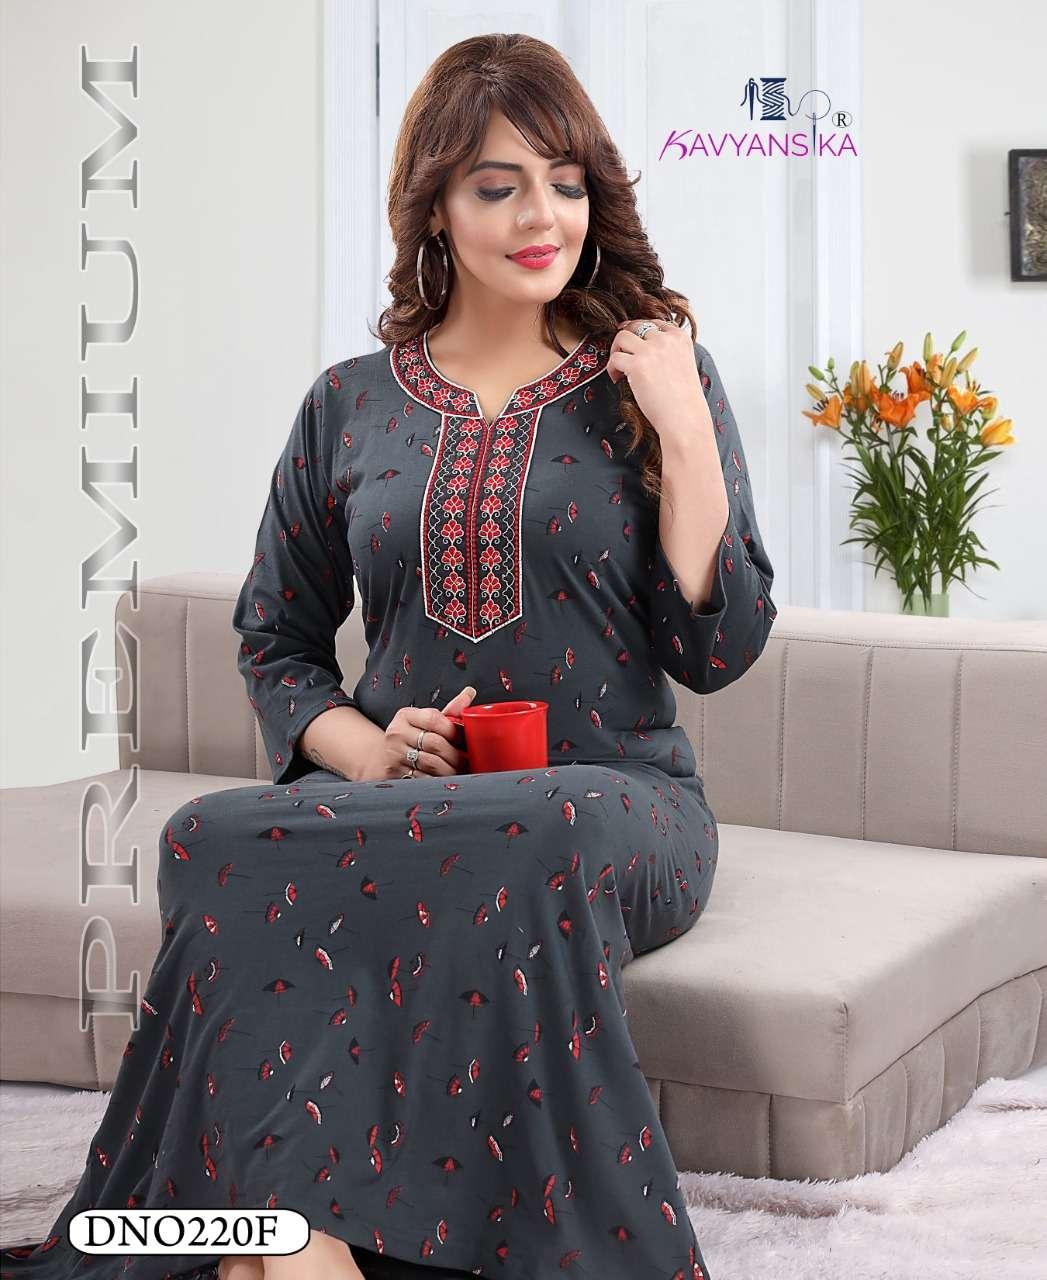 kavyansika vol 220 cotton hosiery women long full sleeves winter nighty